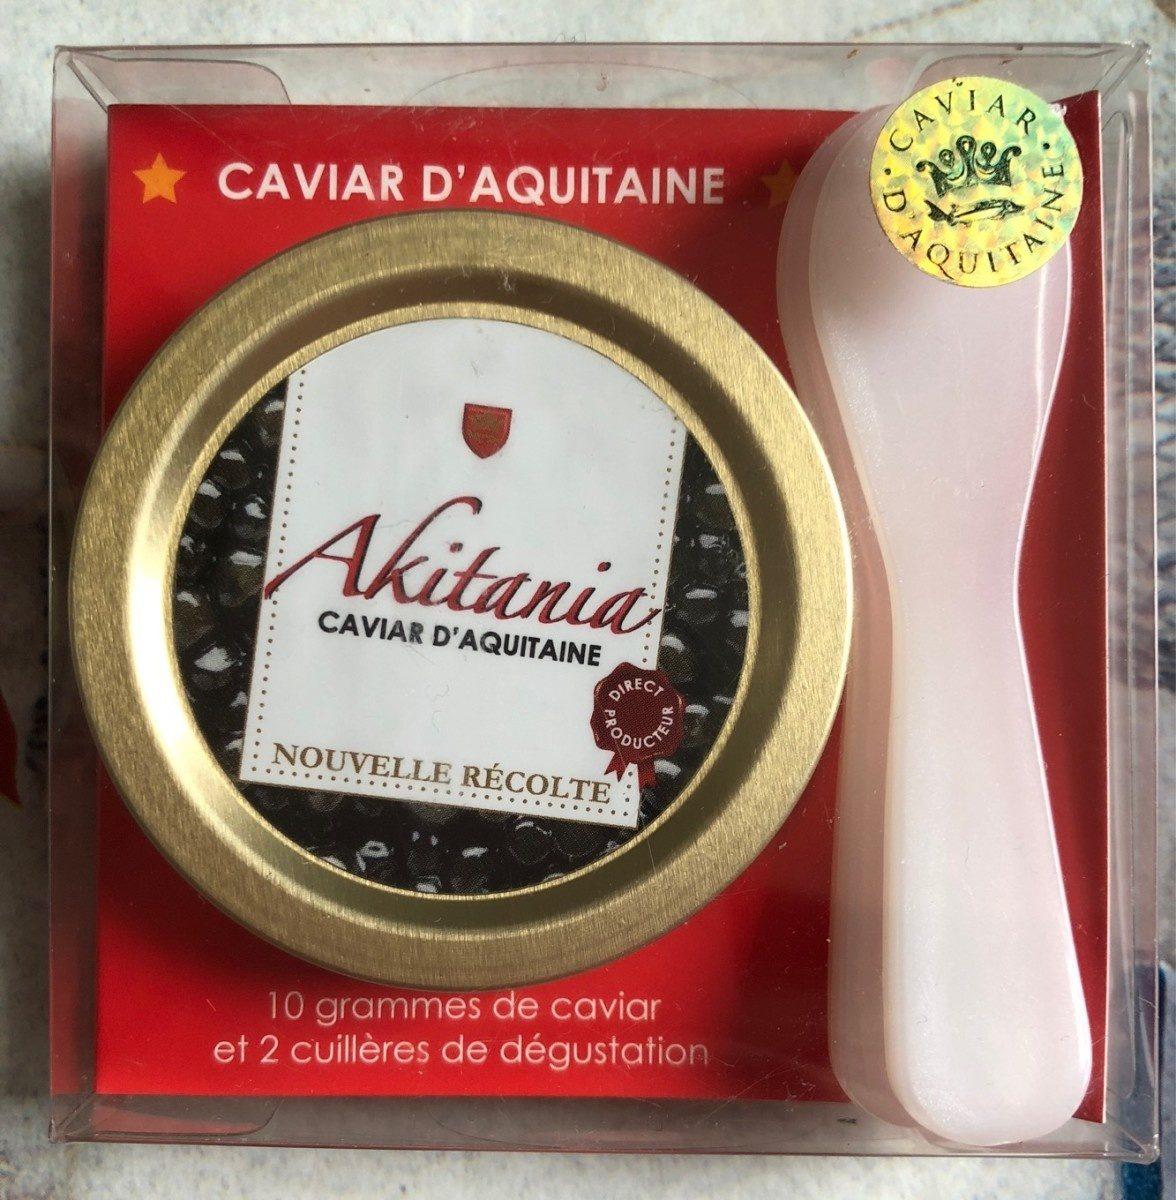 Caviar D'Aquitaine - Product